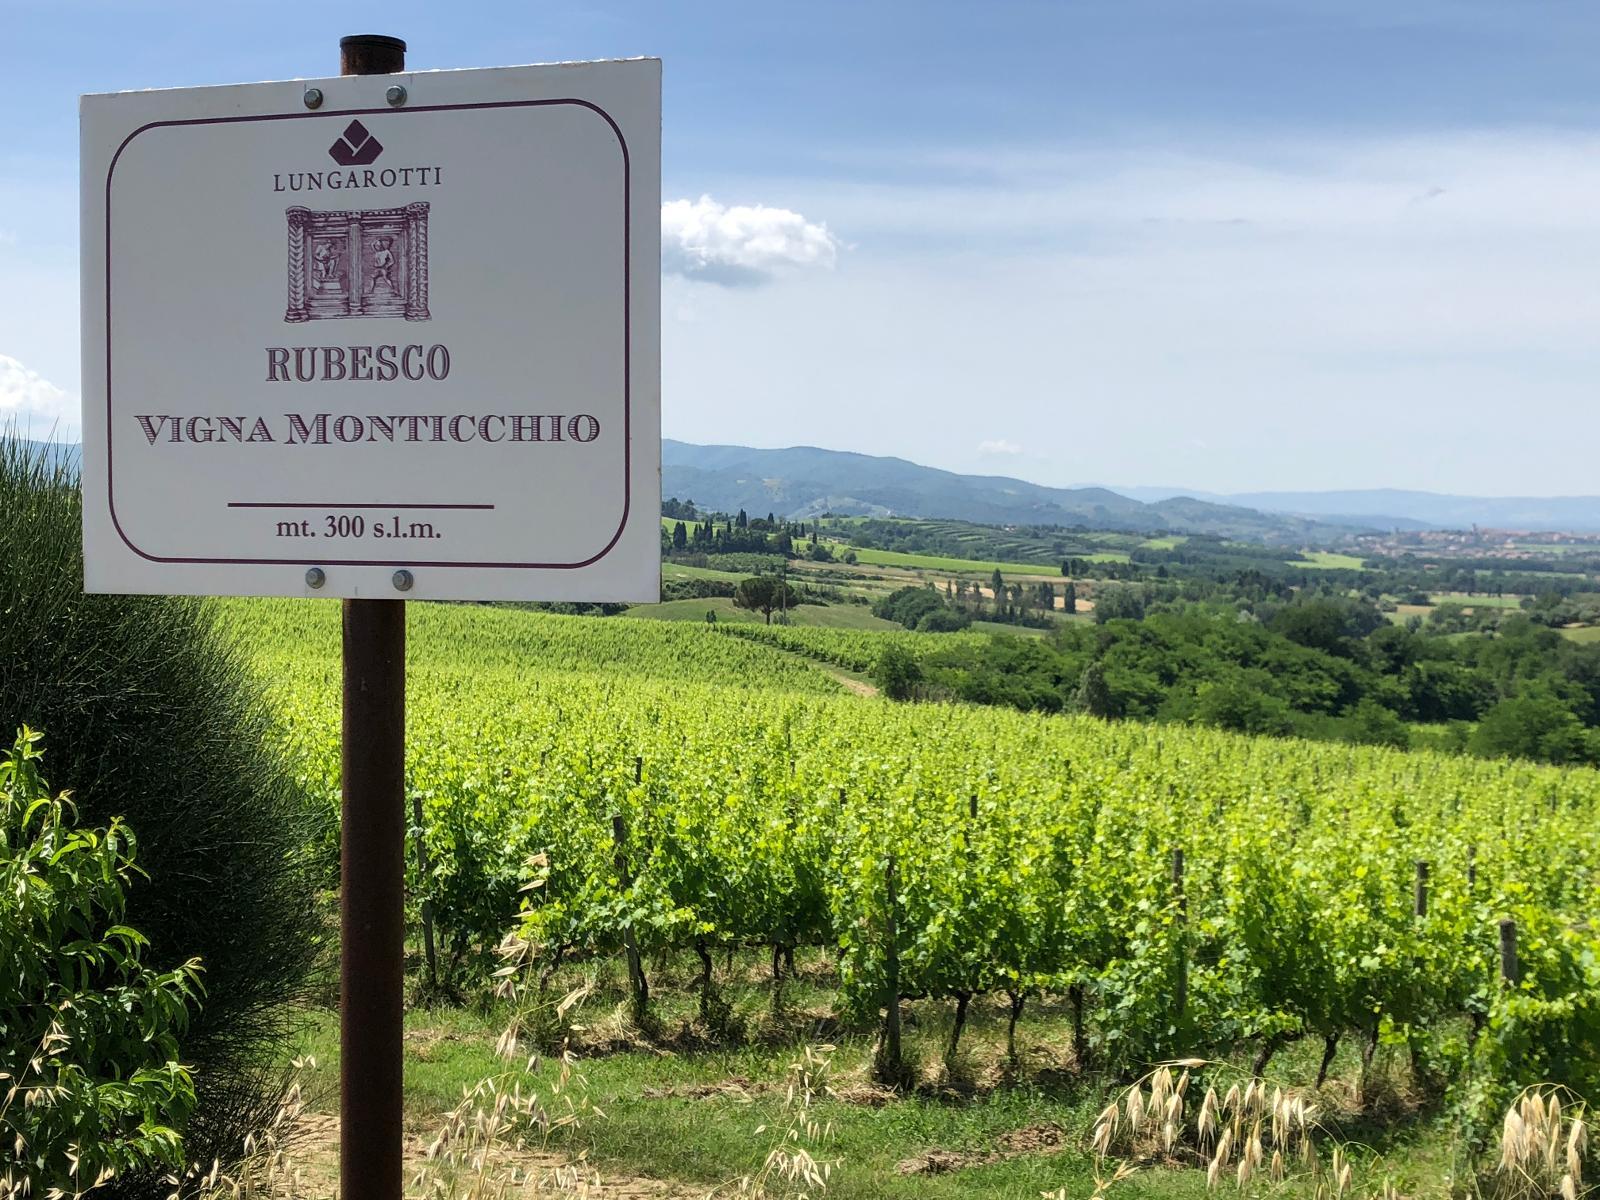 Lungarotti's vineyard